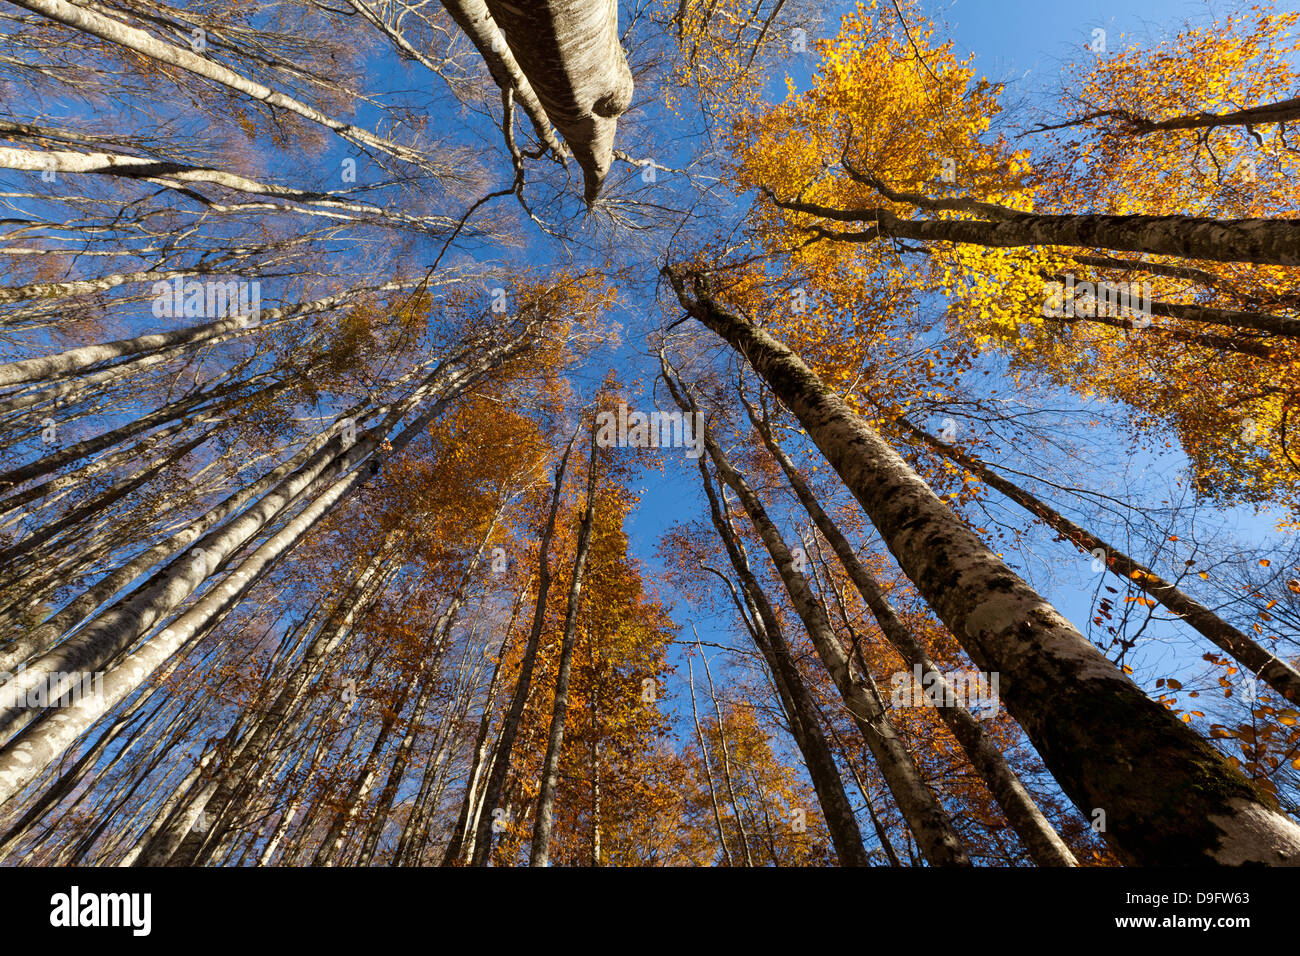 Alpago beech forest in autumn, Belluno, Veneto, Italy - Stock Image